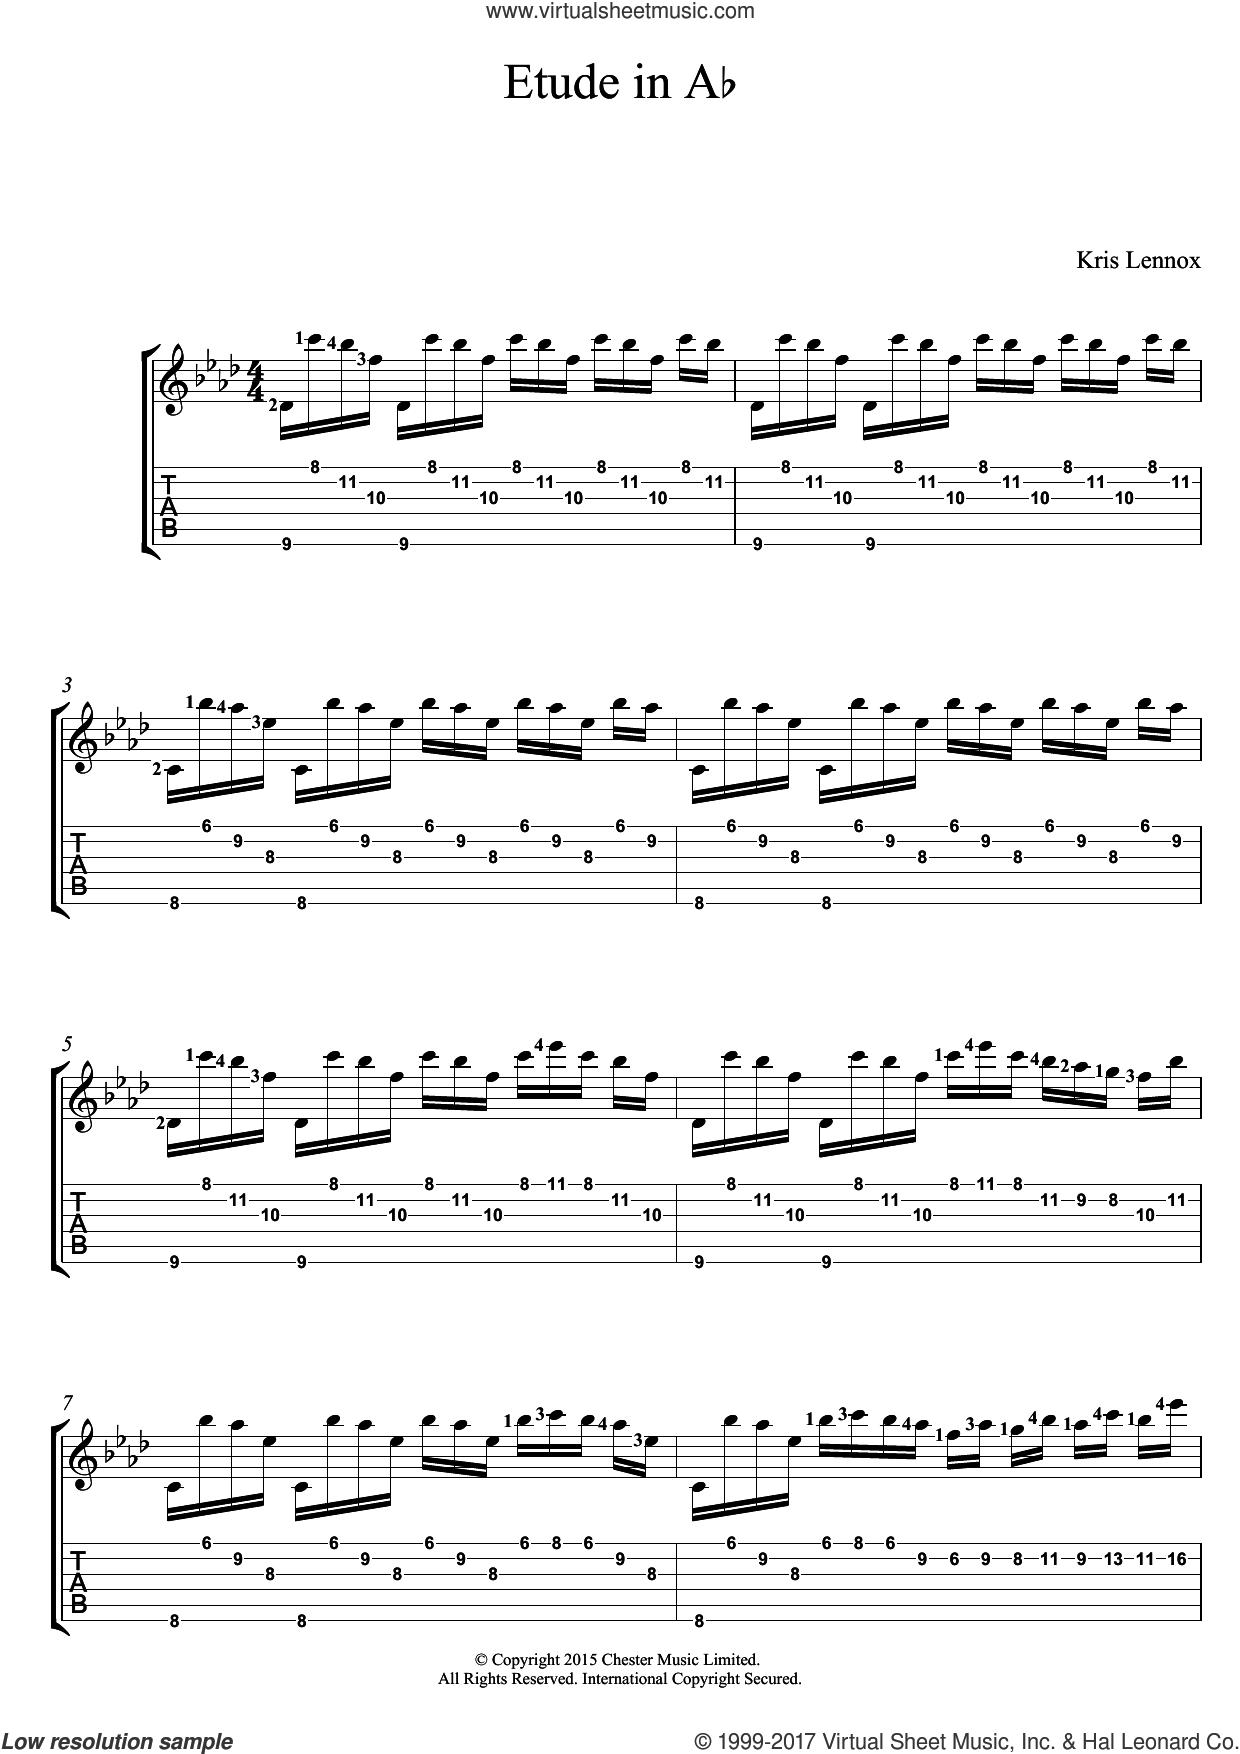 Etude In A Flat sheet music for guitar (tablature) by Kris Lennox, intermediate skill level